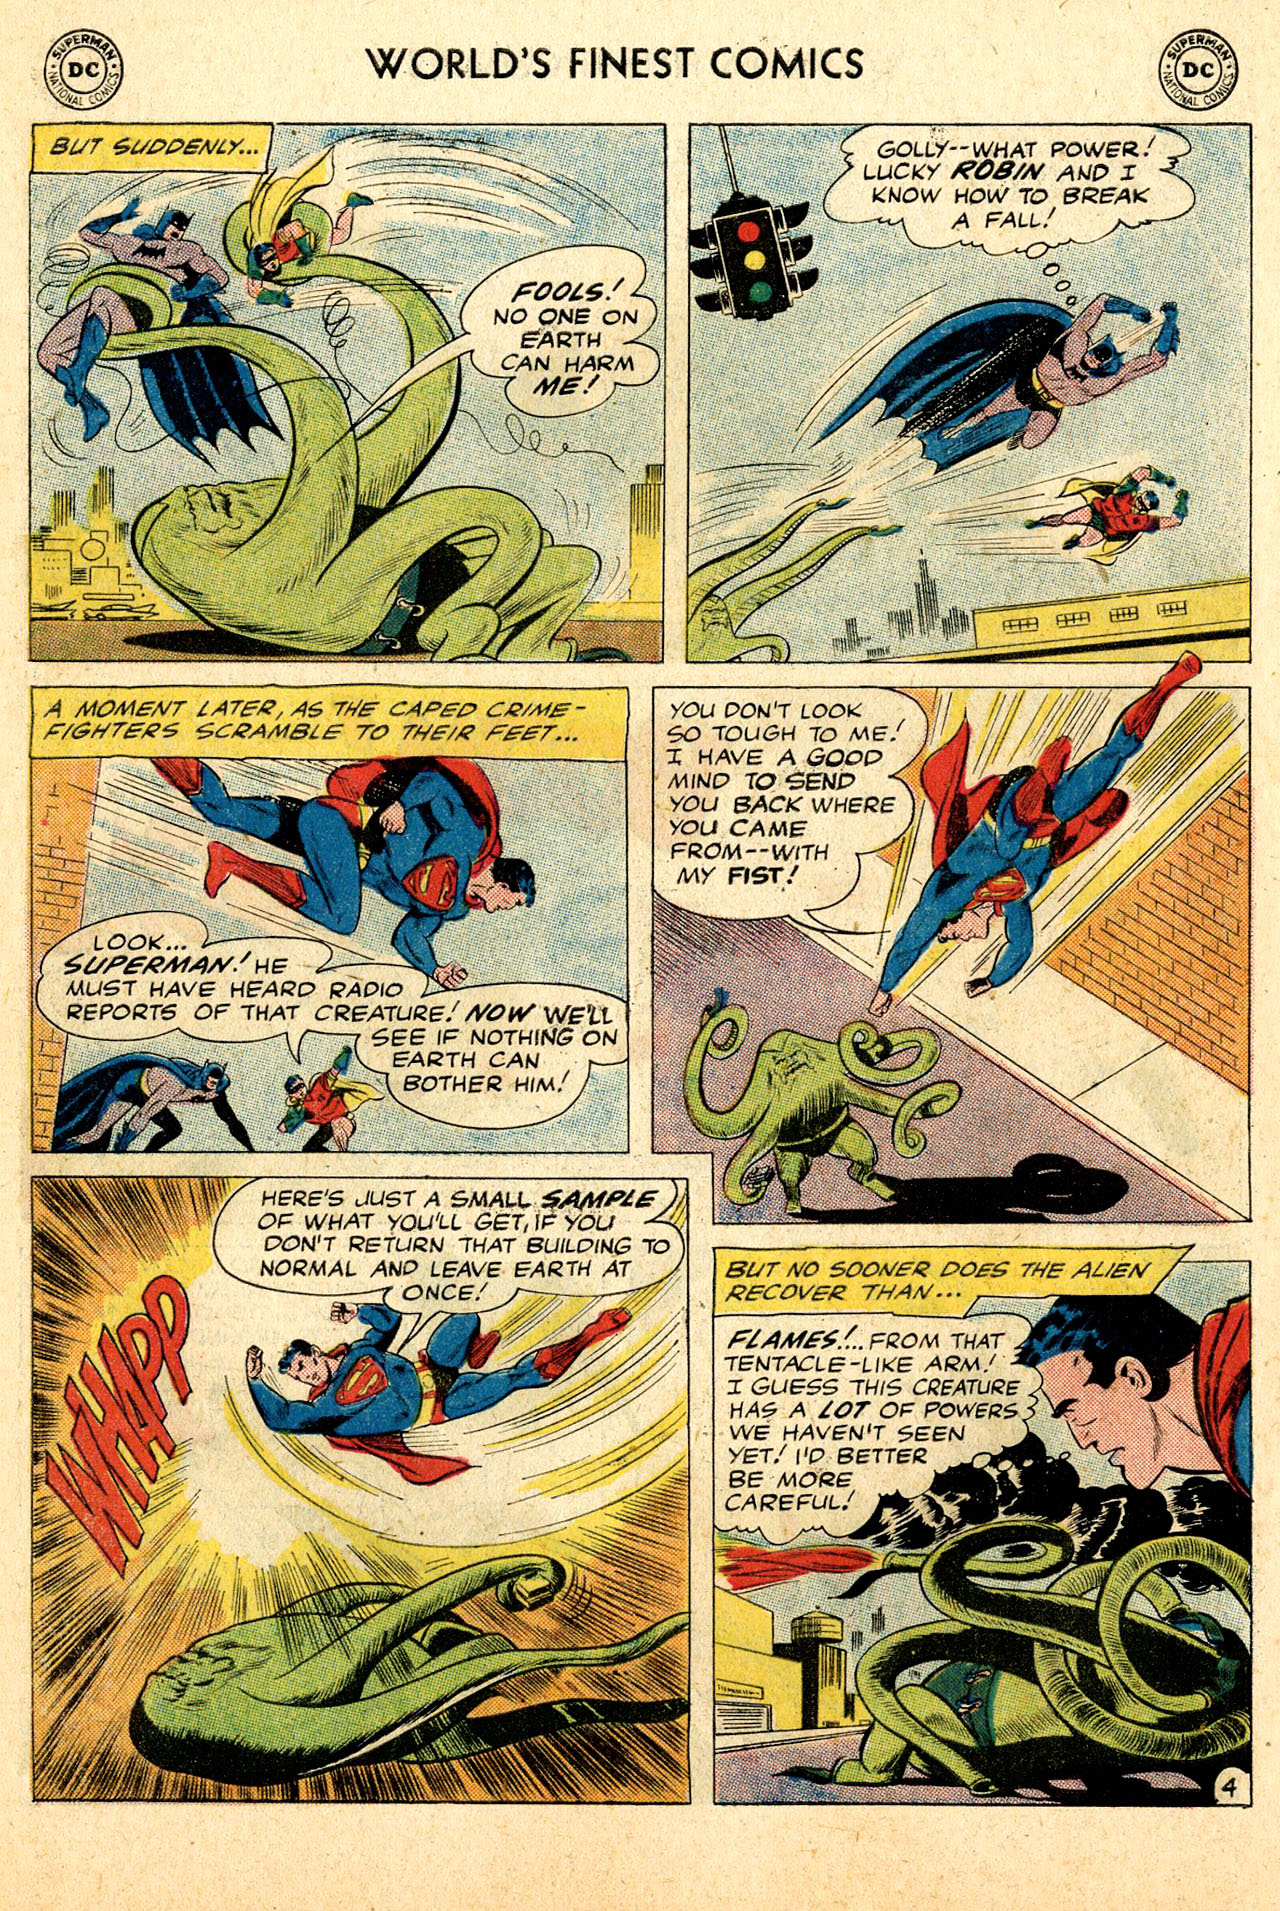 Read online World's Finest Comics comic -  Issue #110 - 6